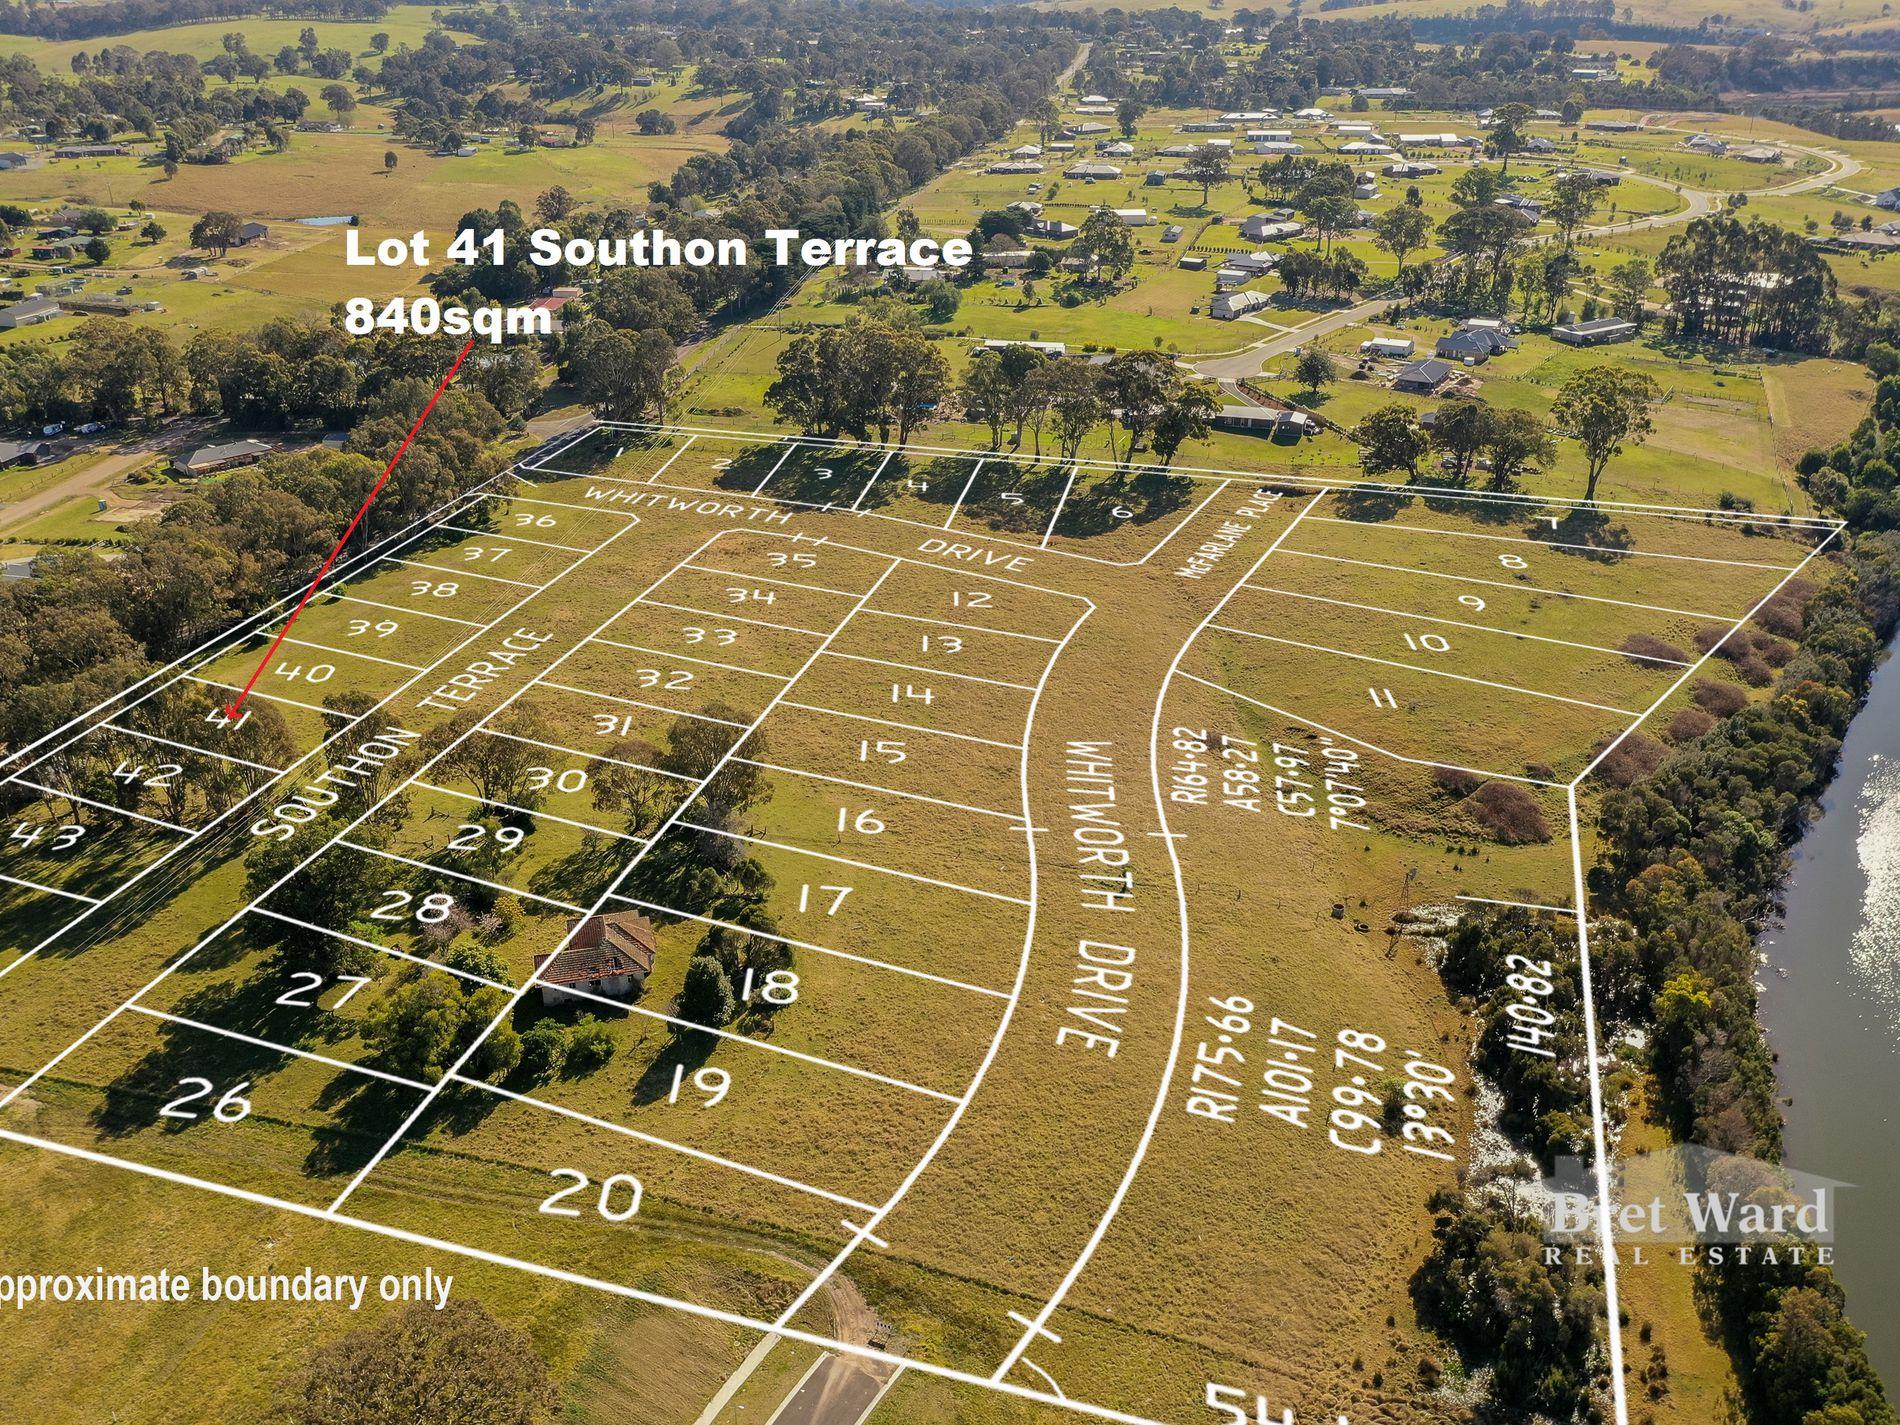 Lot 41 Southon Terrace, Nicholson